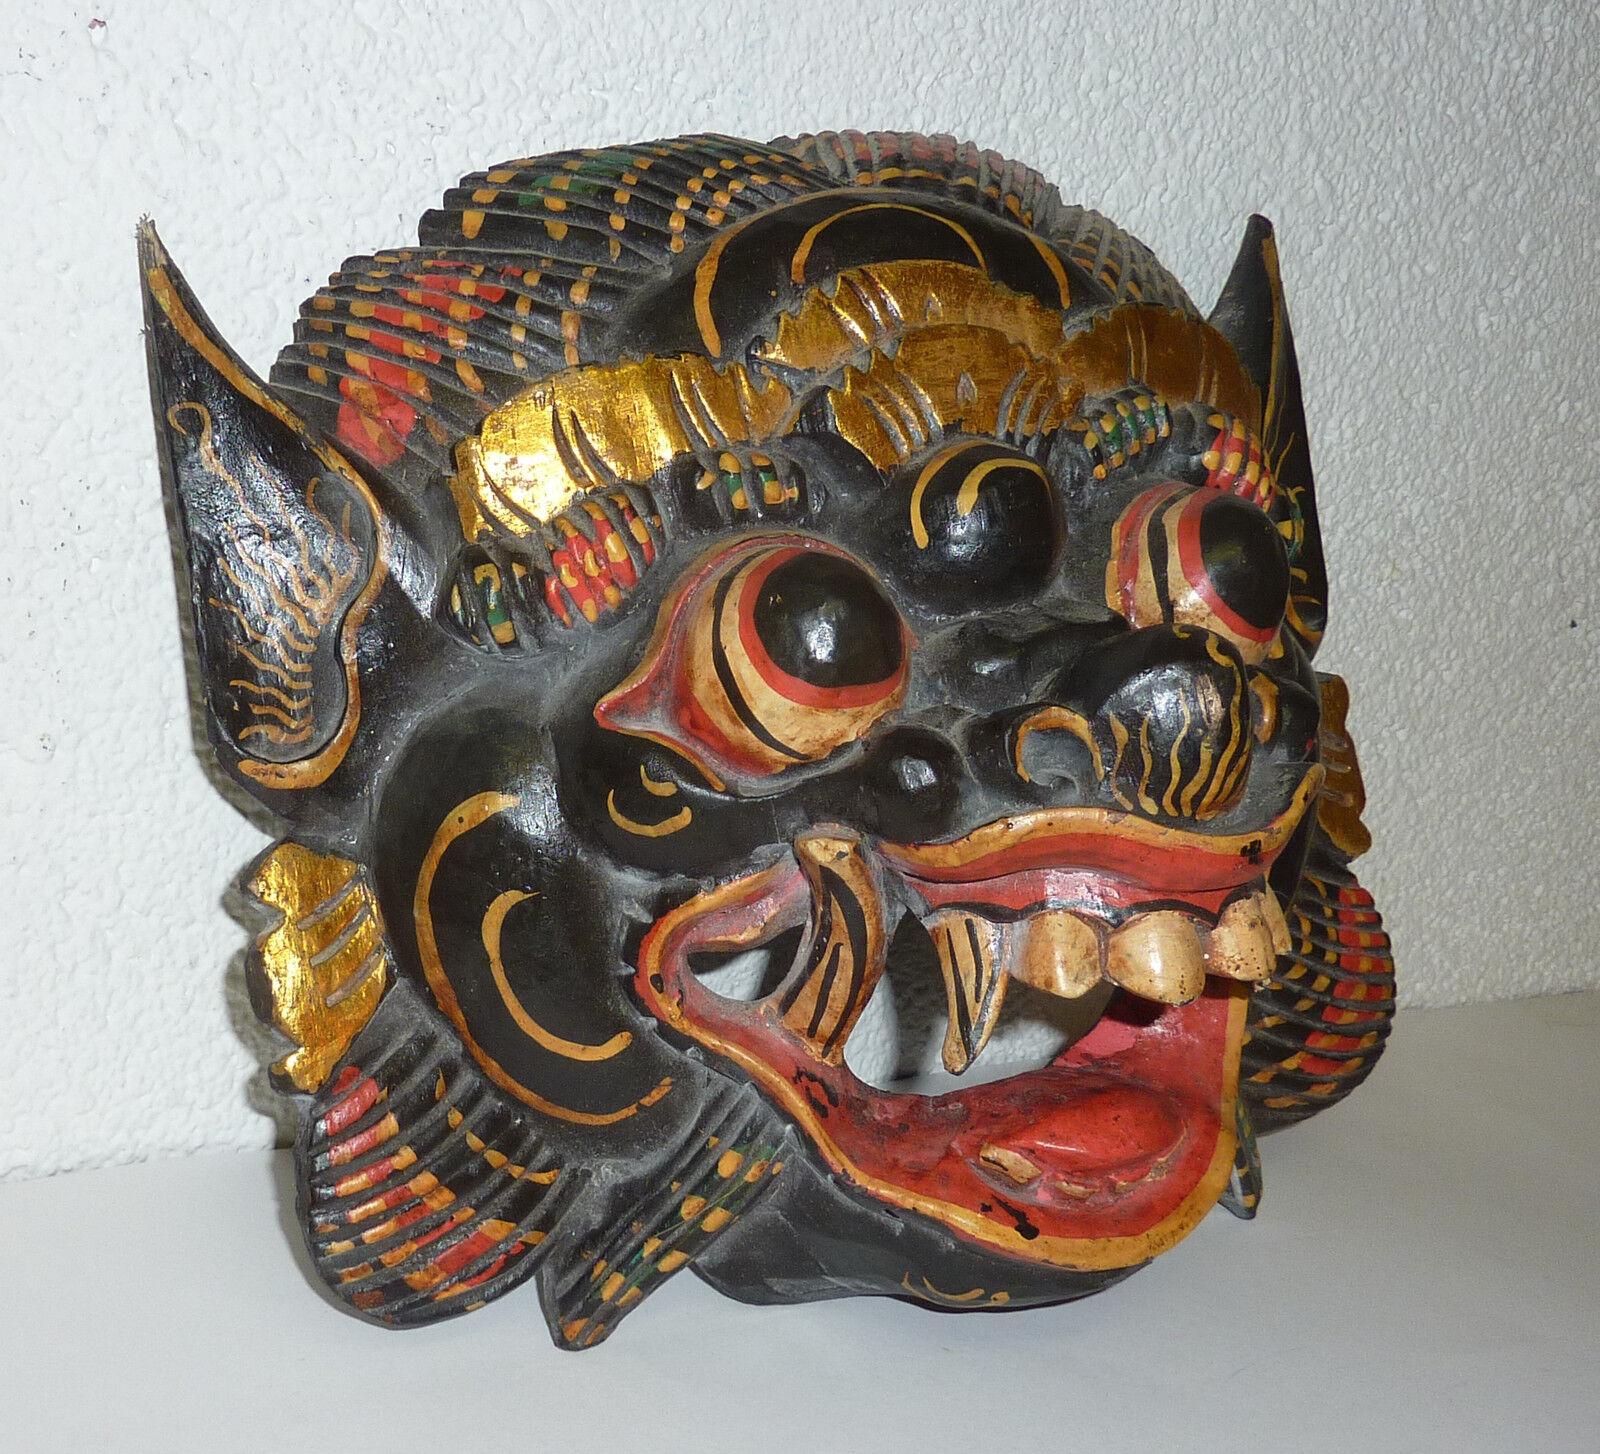 Asiatika Maske Fabelwesen große Holzmaske Ritualmaske Dämon Dämonen Maske